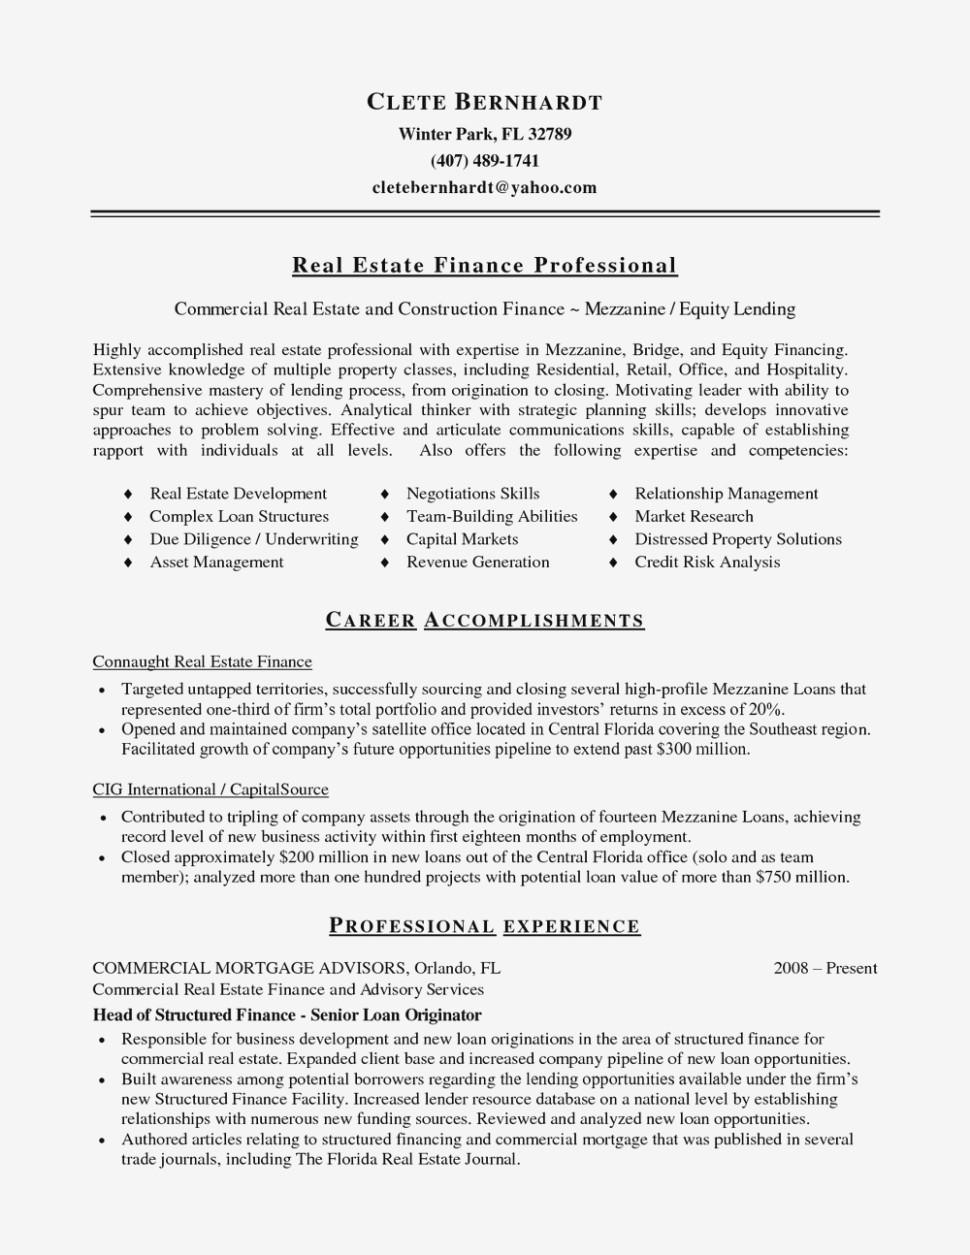 real estate investor resume pdf real estate investor resume samples real estate investor resume examples real estate investor resume 2019 real estate investing resume real estate investing resume sample real estate investing resume example